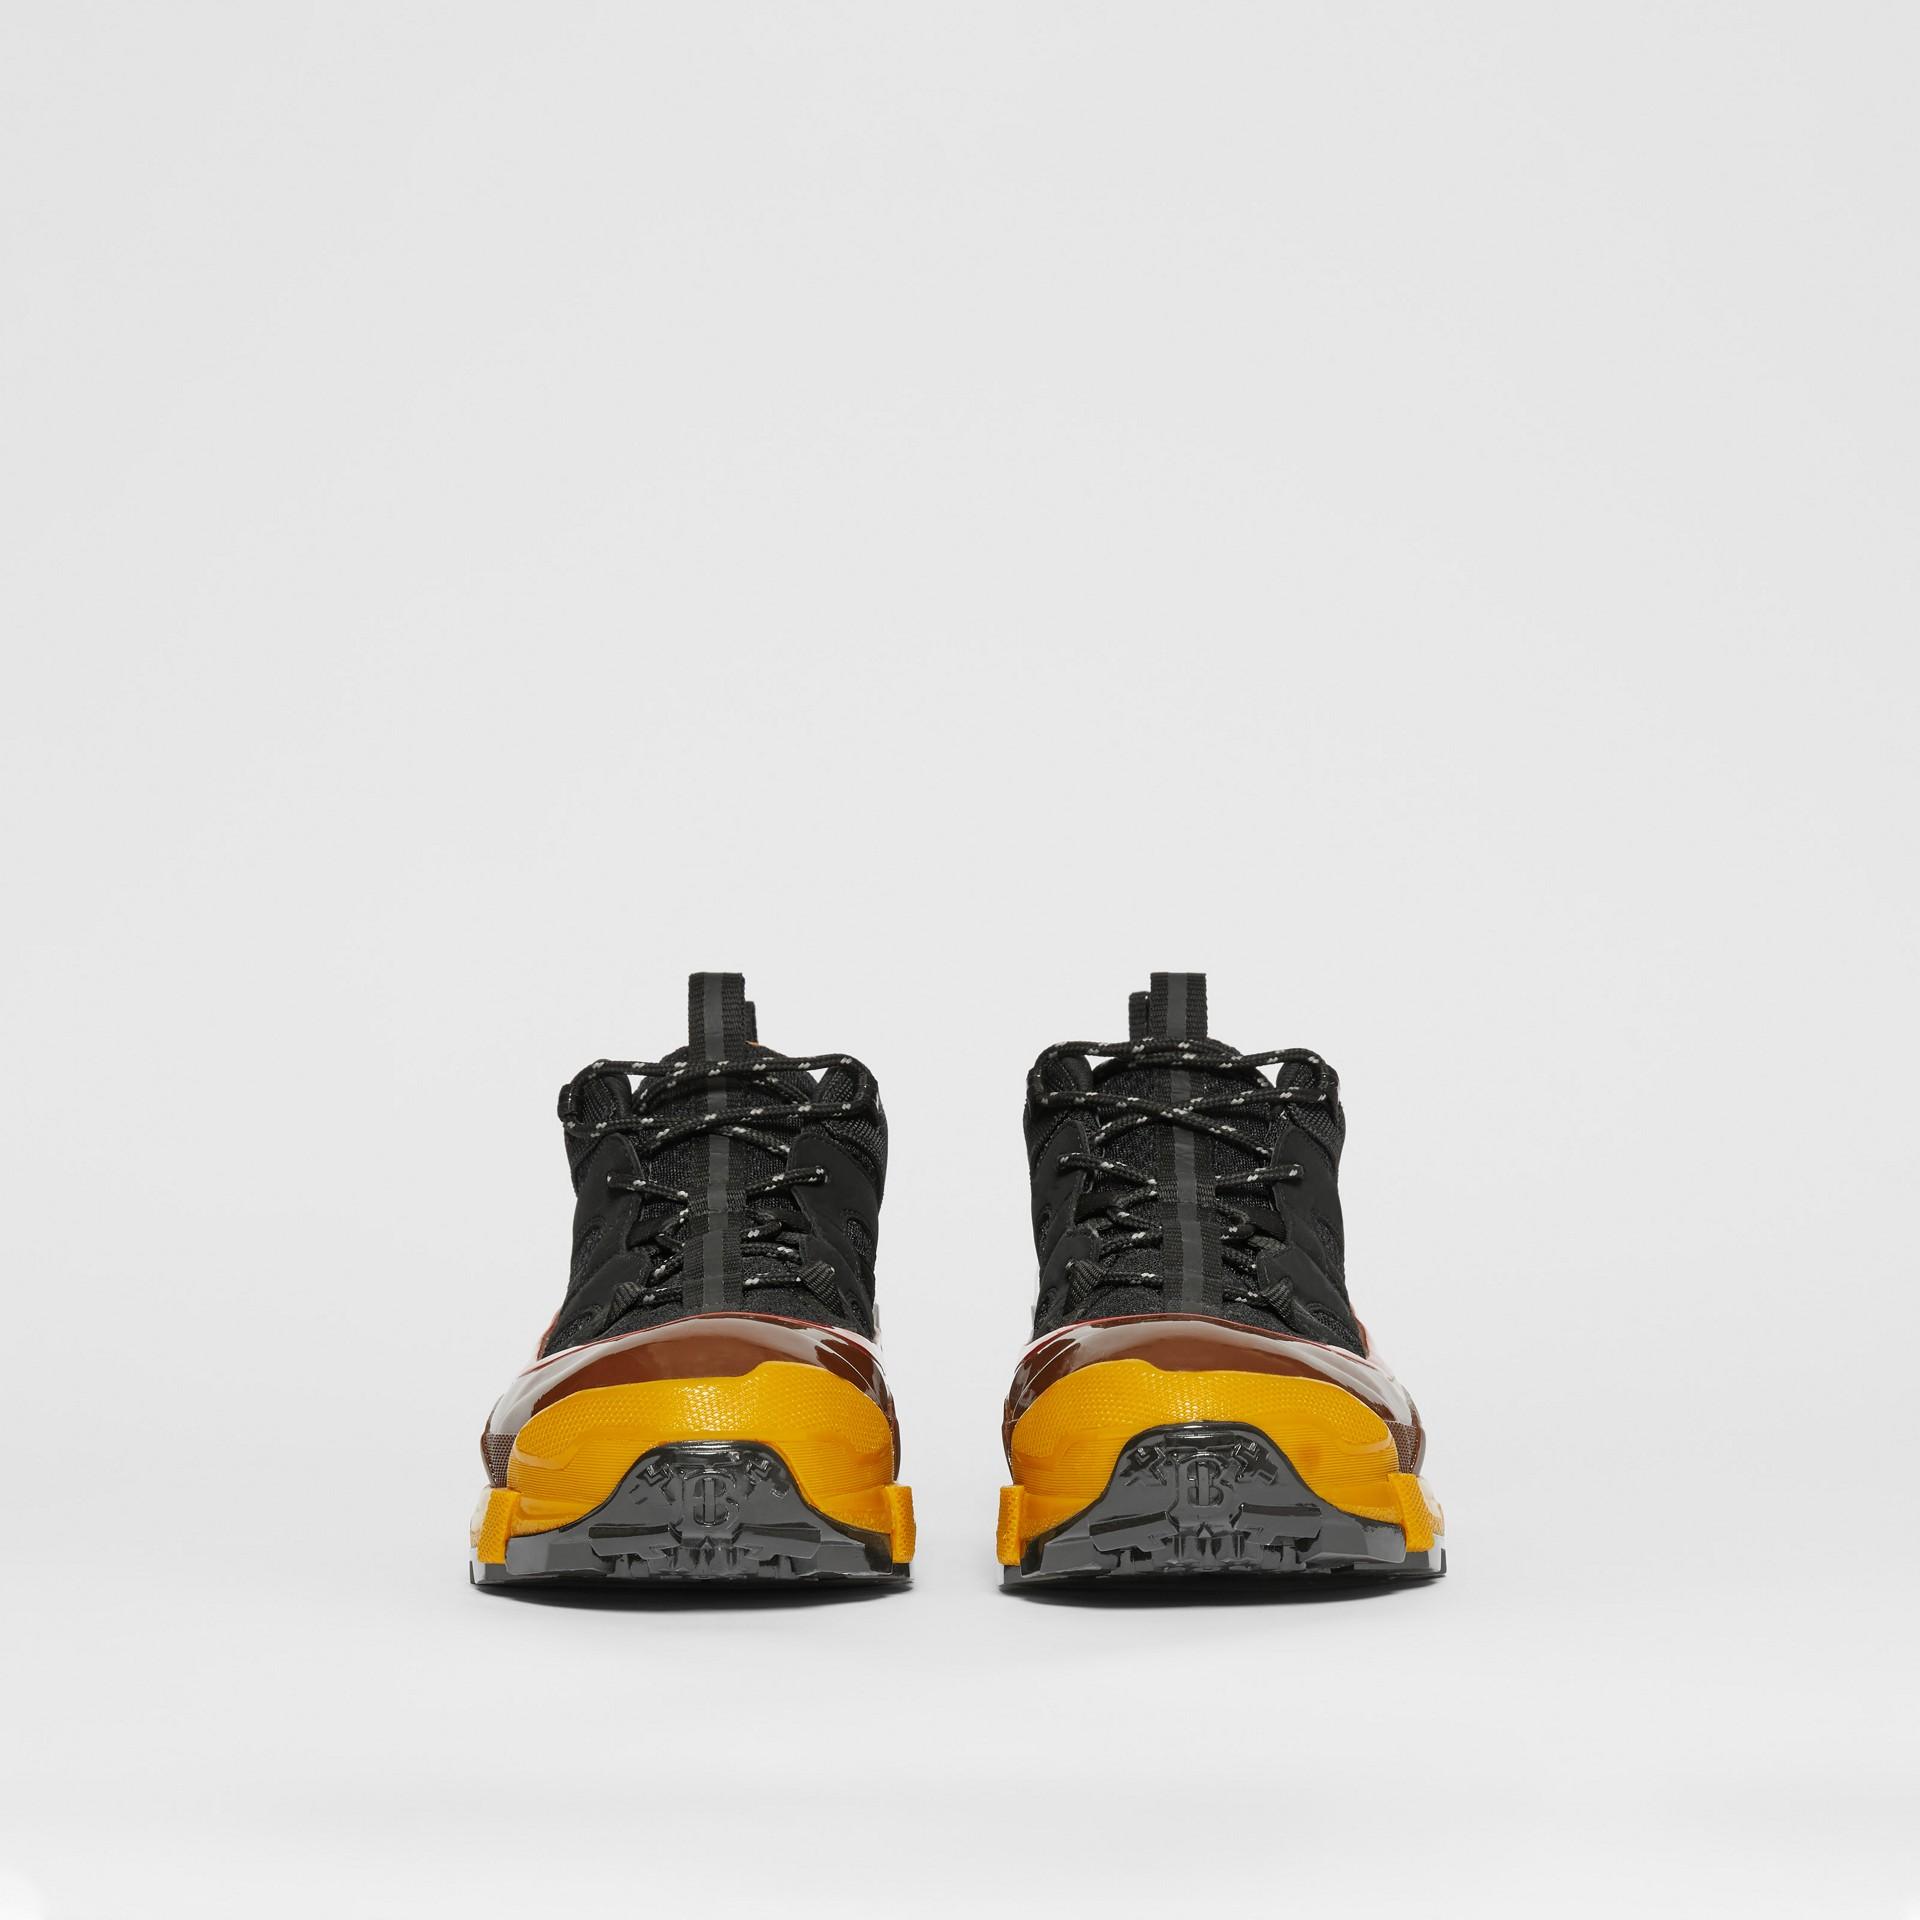 Mesh, Nylon and Nubuck Arthur Sneakers in Black/yellow   Burberry - gallery image 2